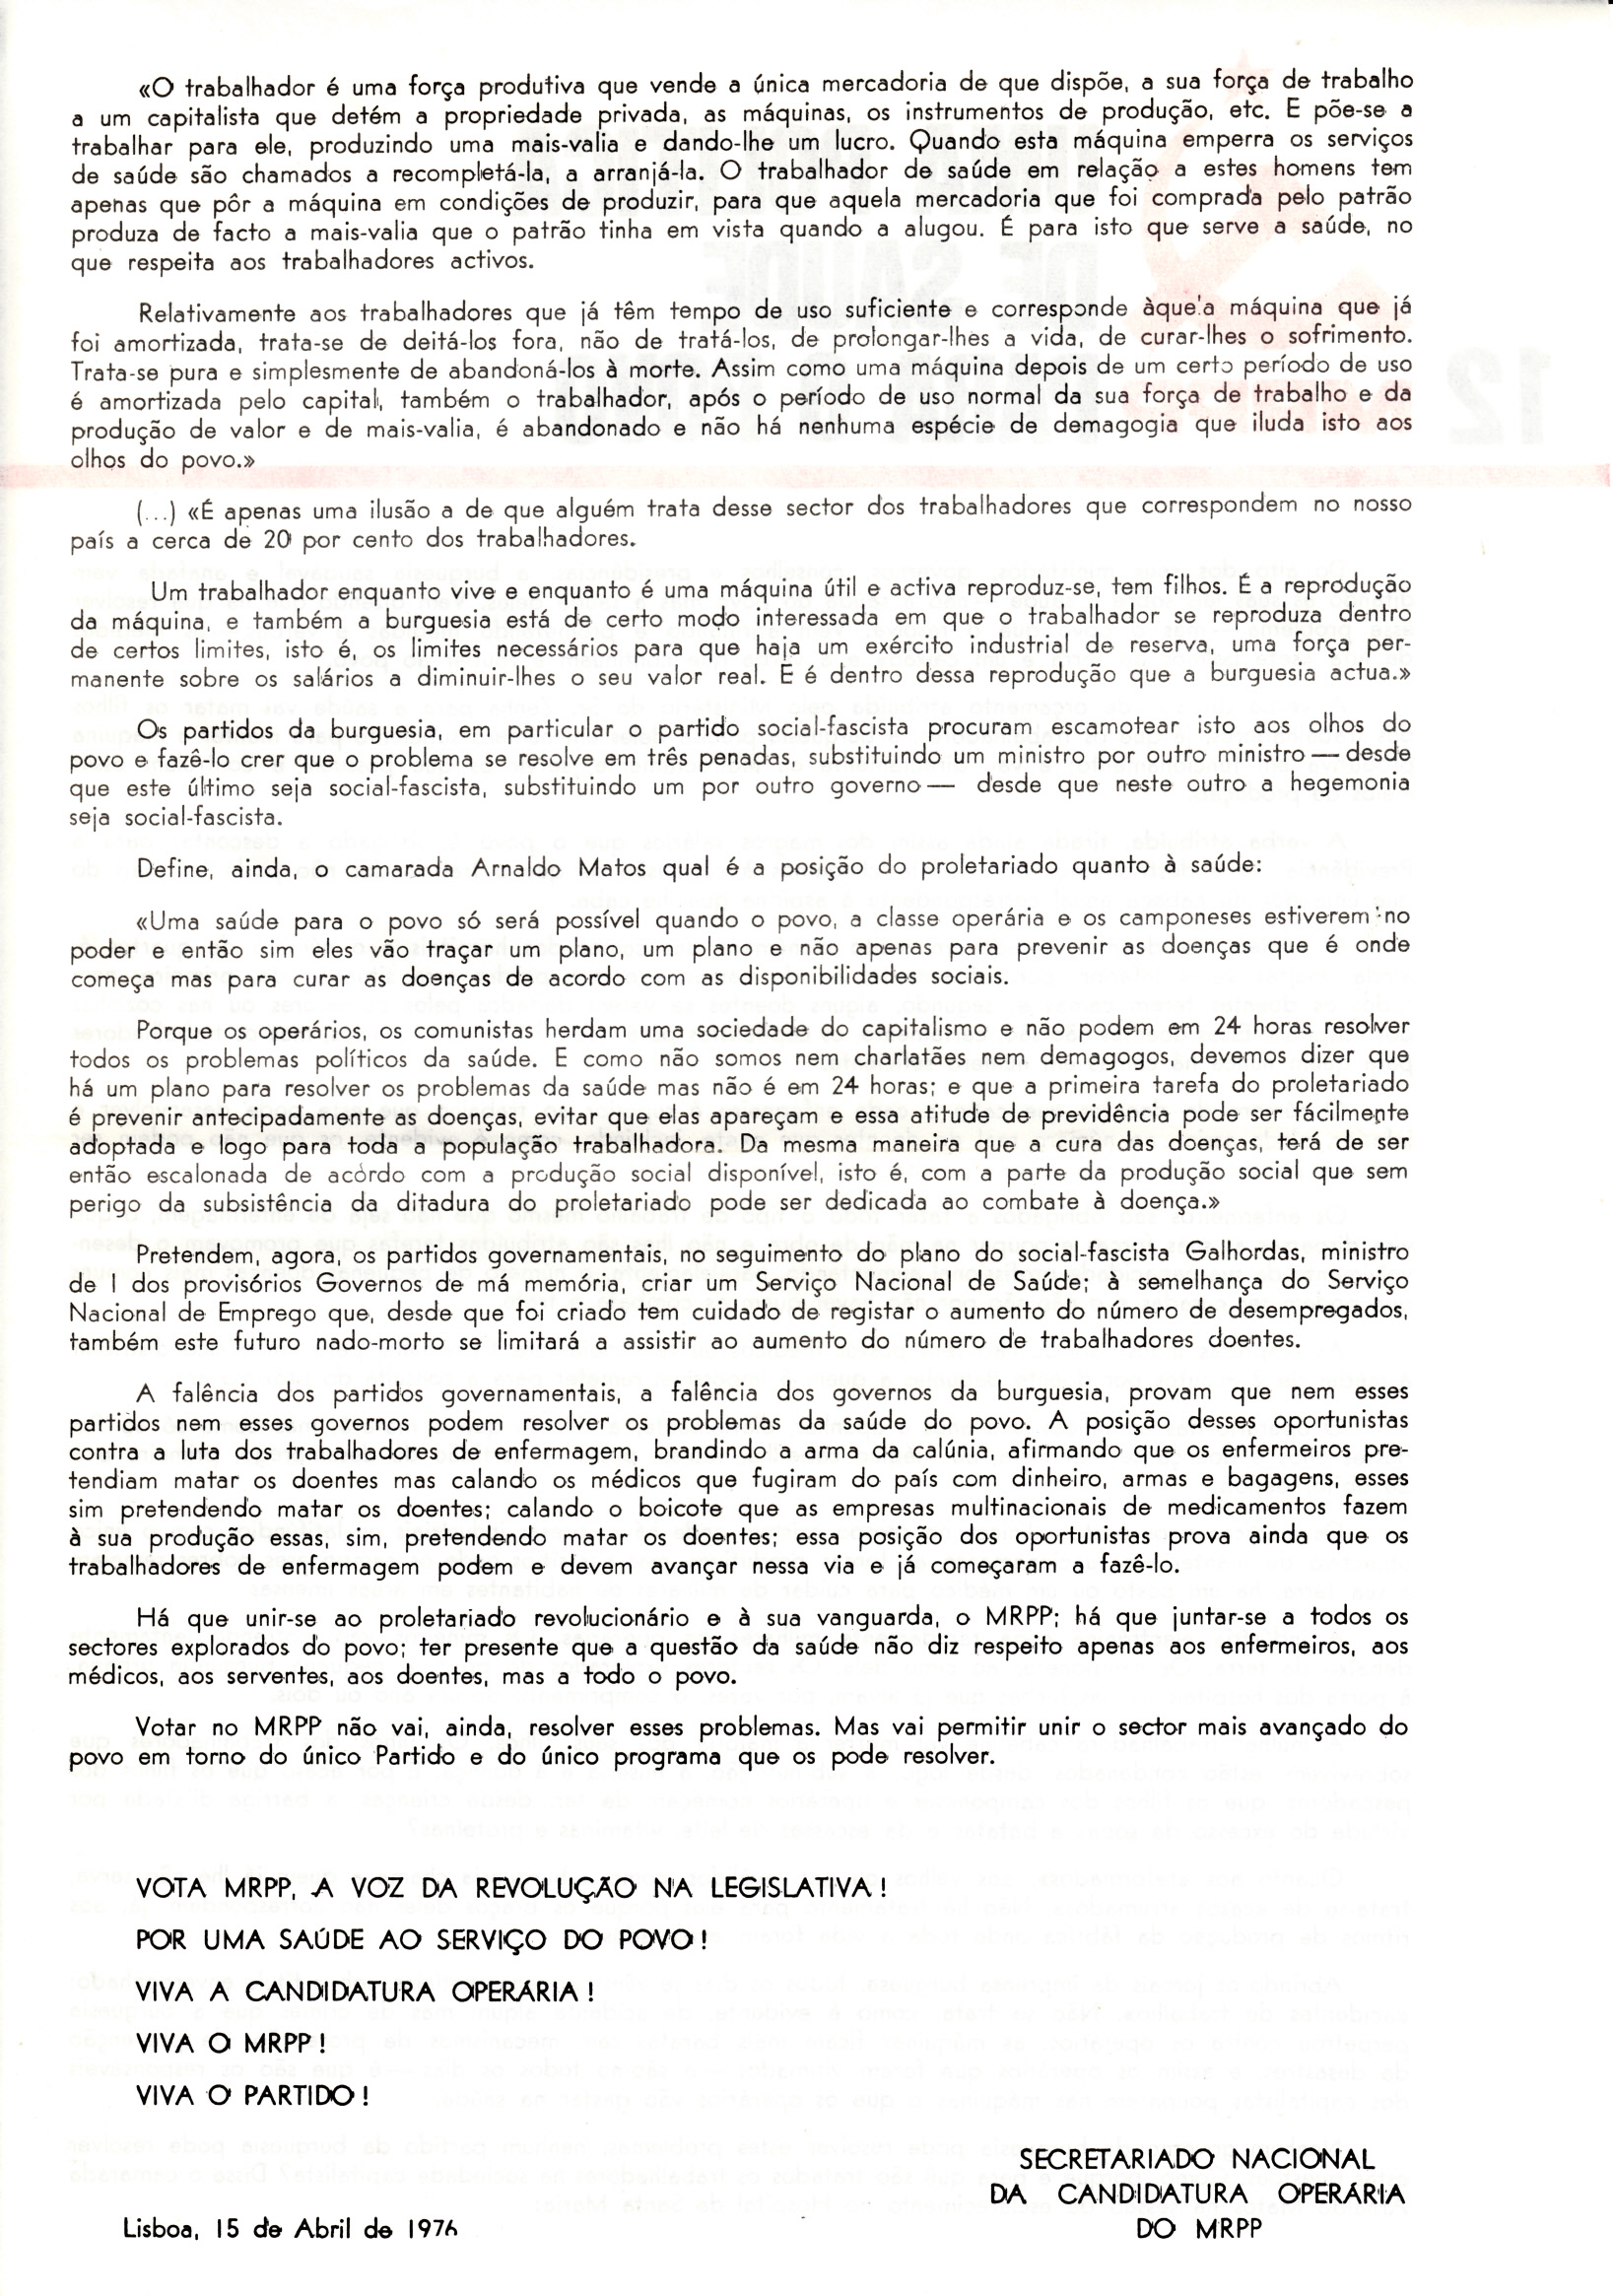 mrpp_1976_eleicao_programa_0024